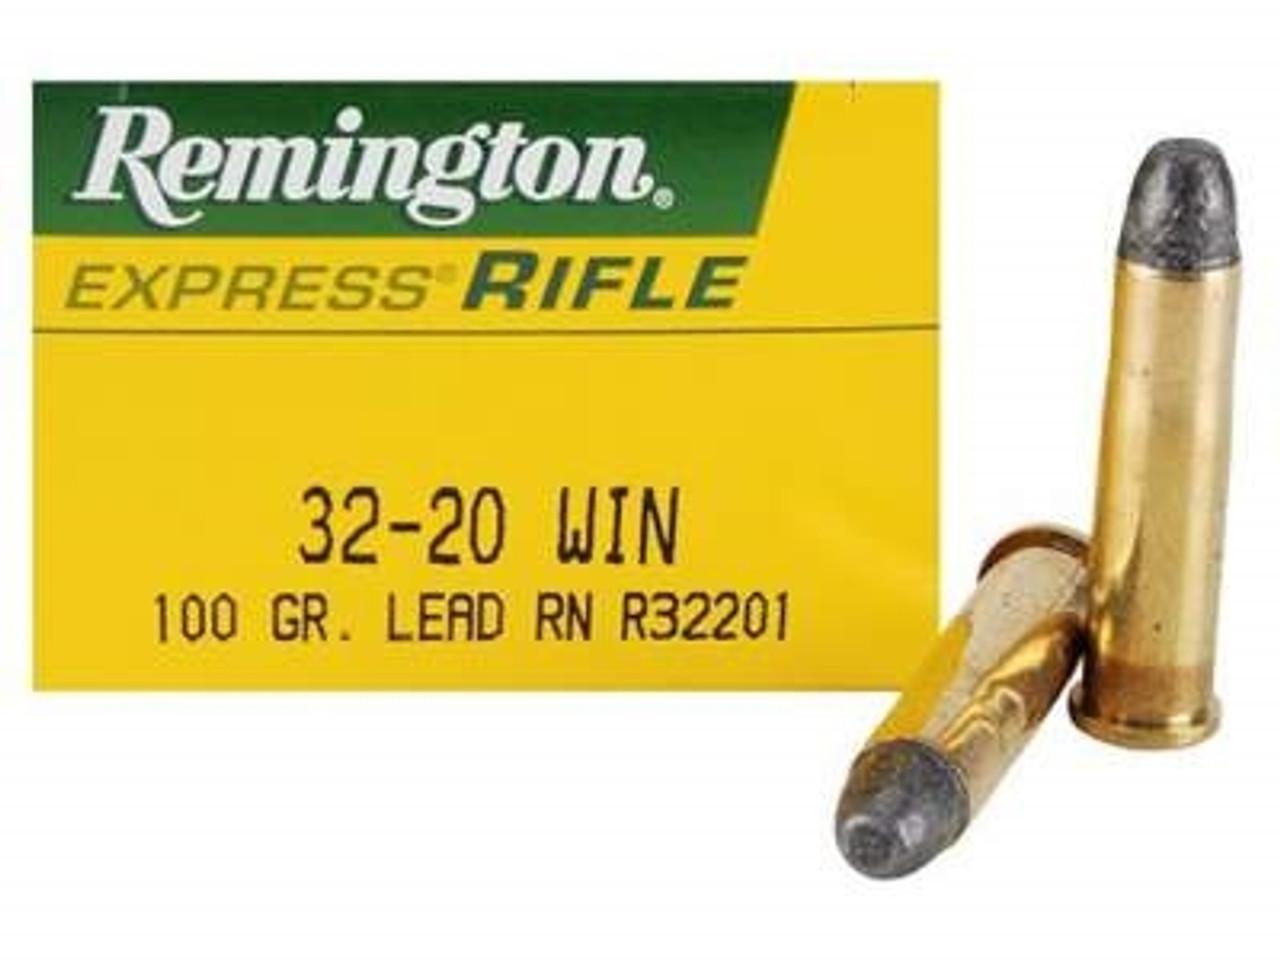 Remington Express 32-20 Win, 100gr Lead RN, 50 Rds